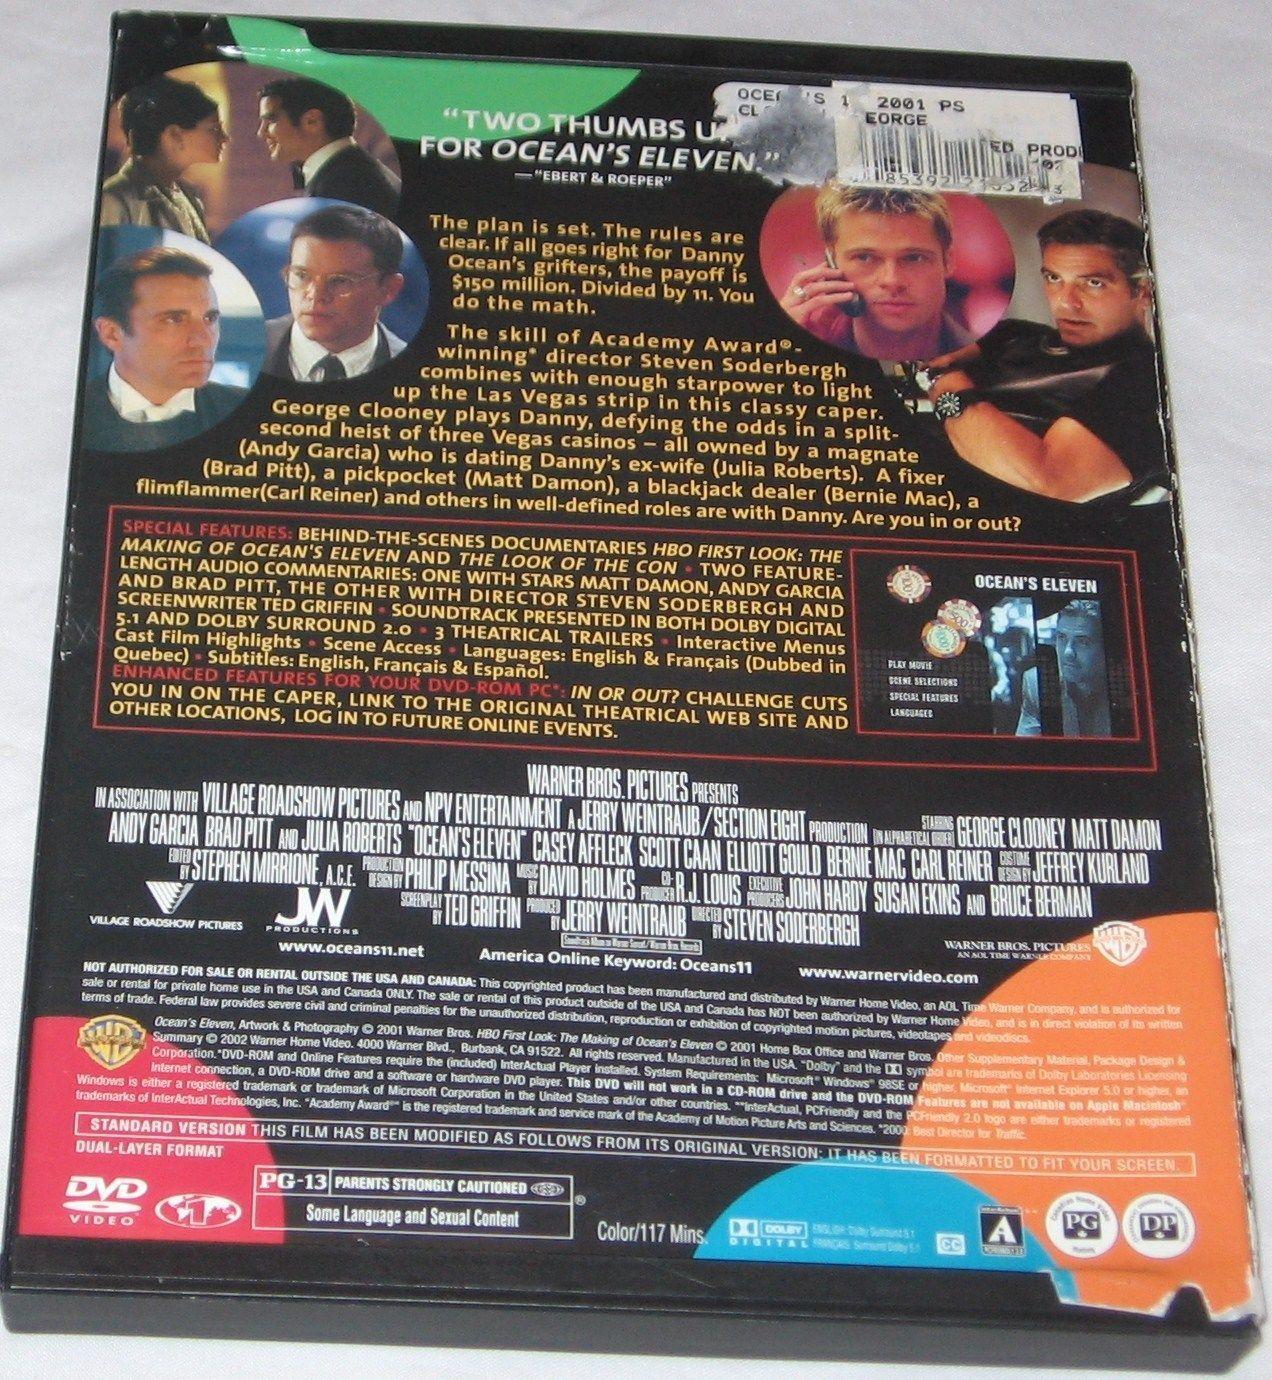 Oceans Eleven DVD 2002 Full Frame Edition George Clooney Brad Pitt Free Ship USA